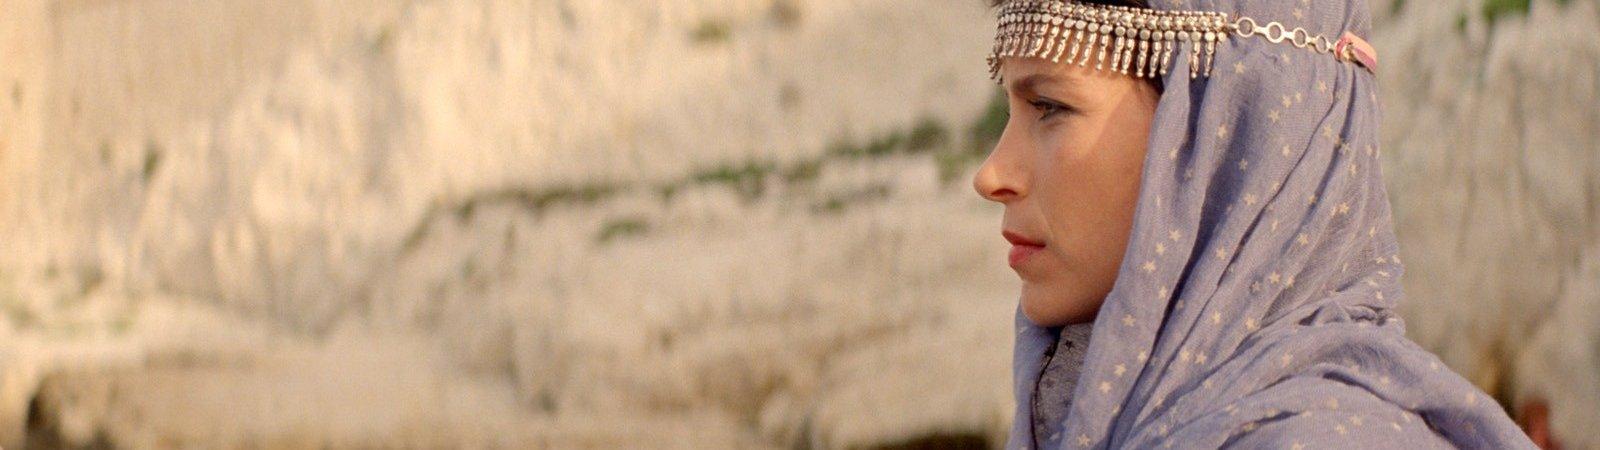 Photo dernier film Miguel Gomes